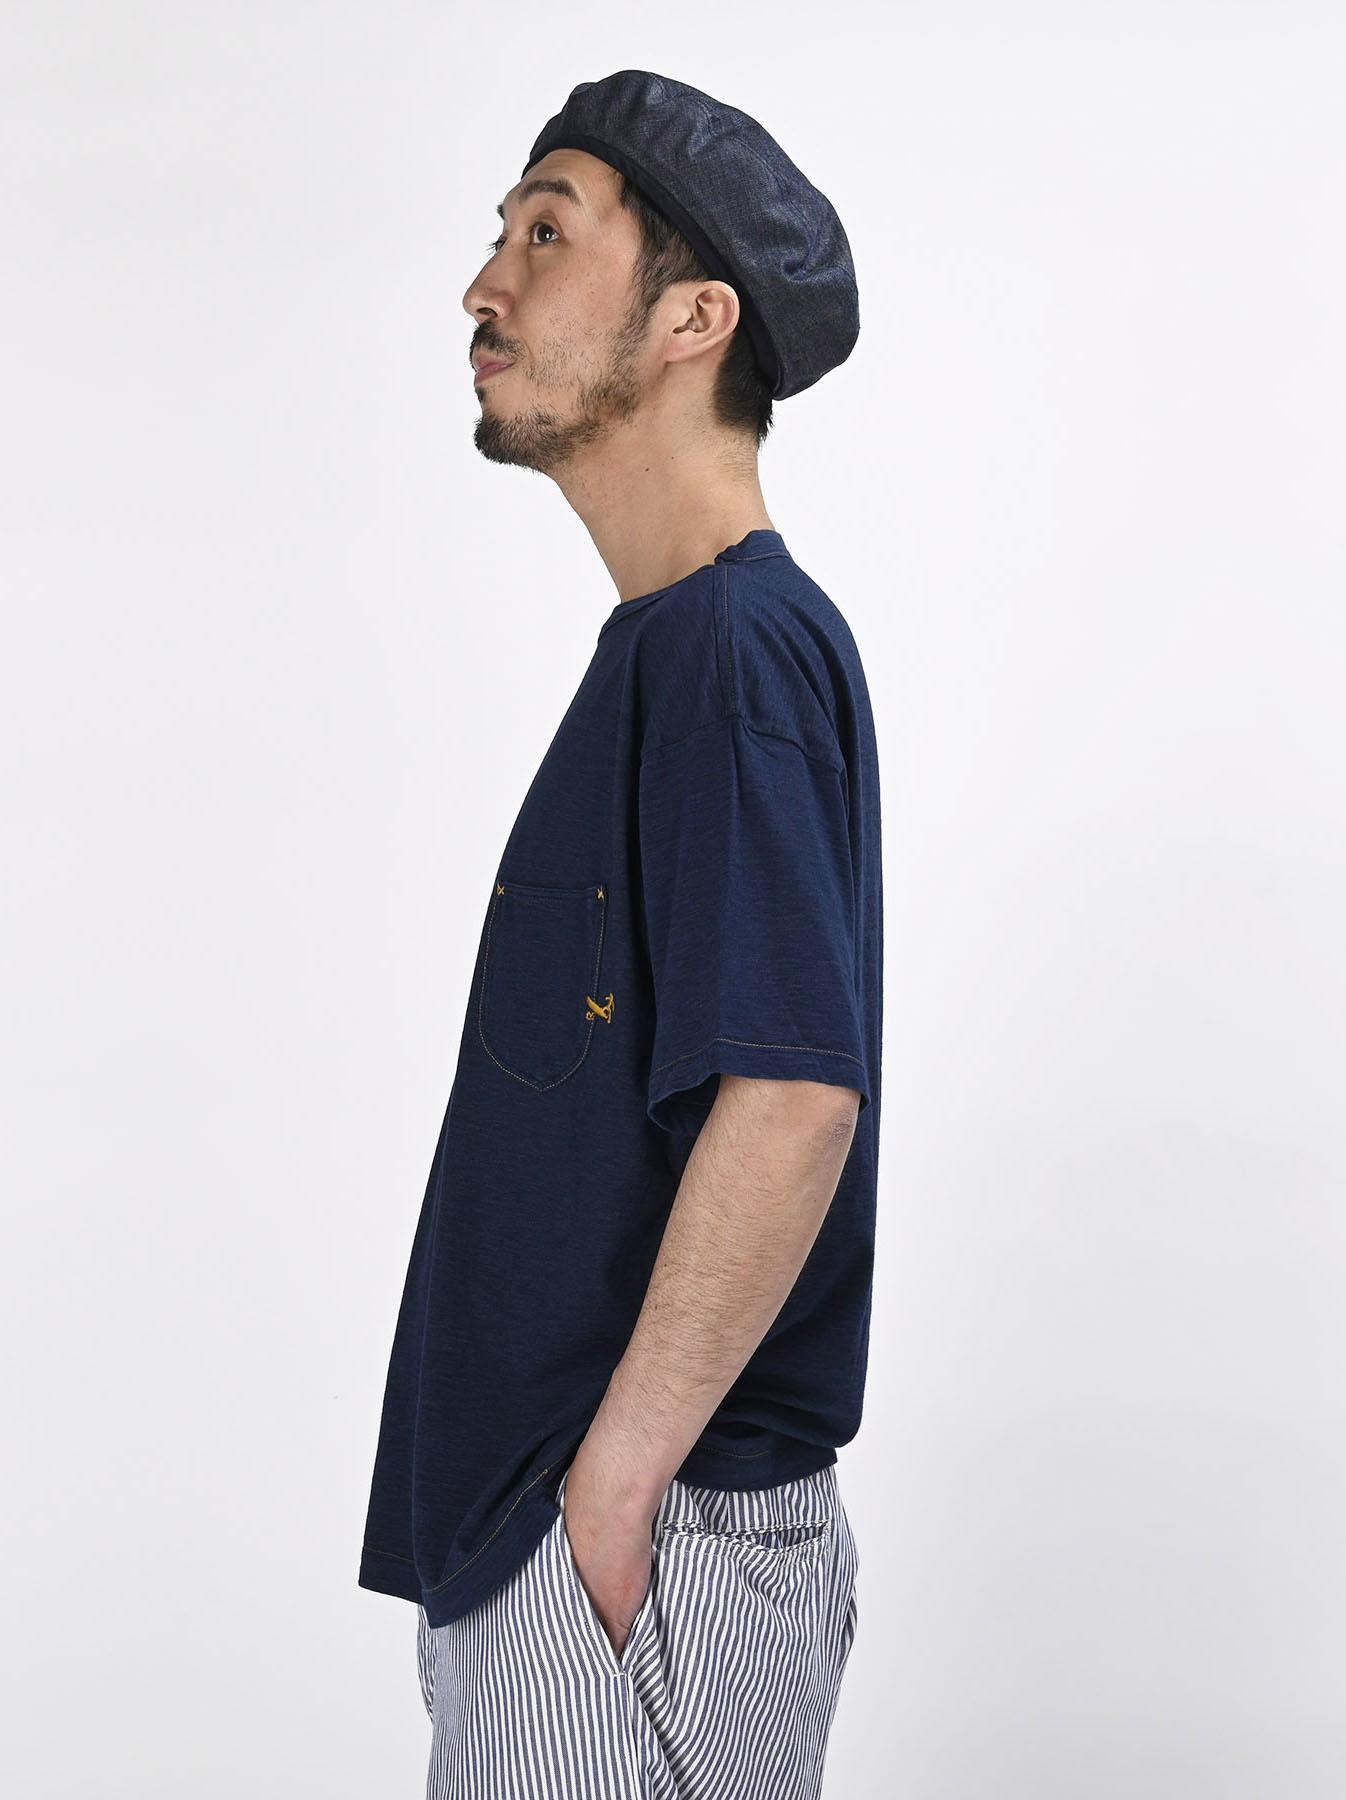 Indigo Hayama-kun Embroidered 908 Ocean T-shirt (0621)-4